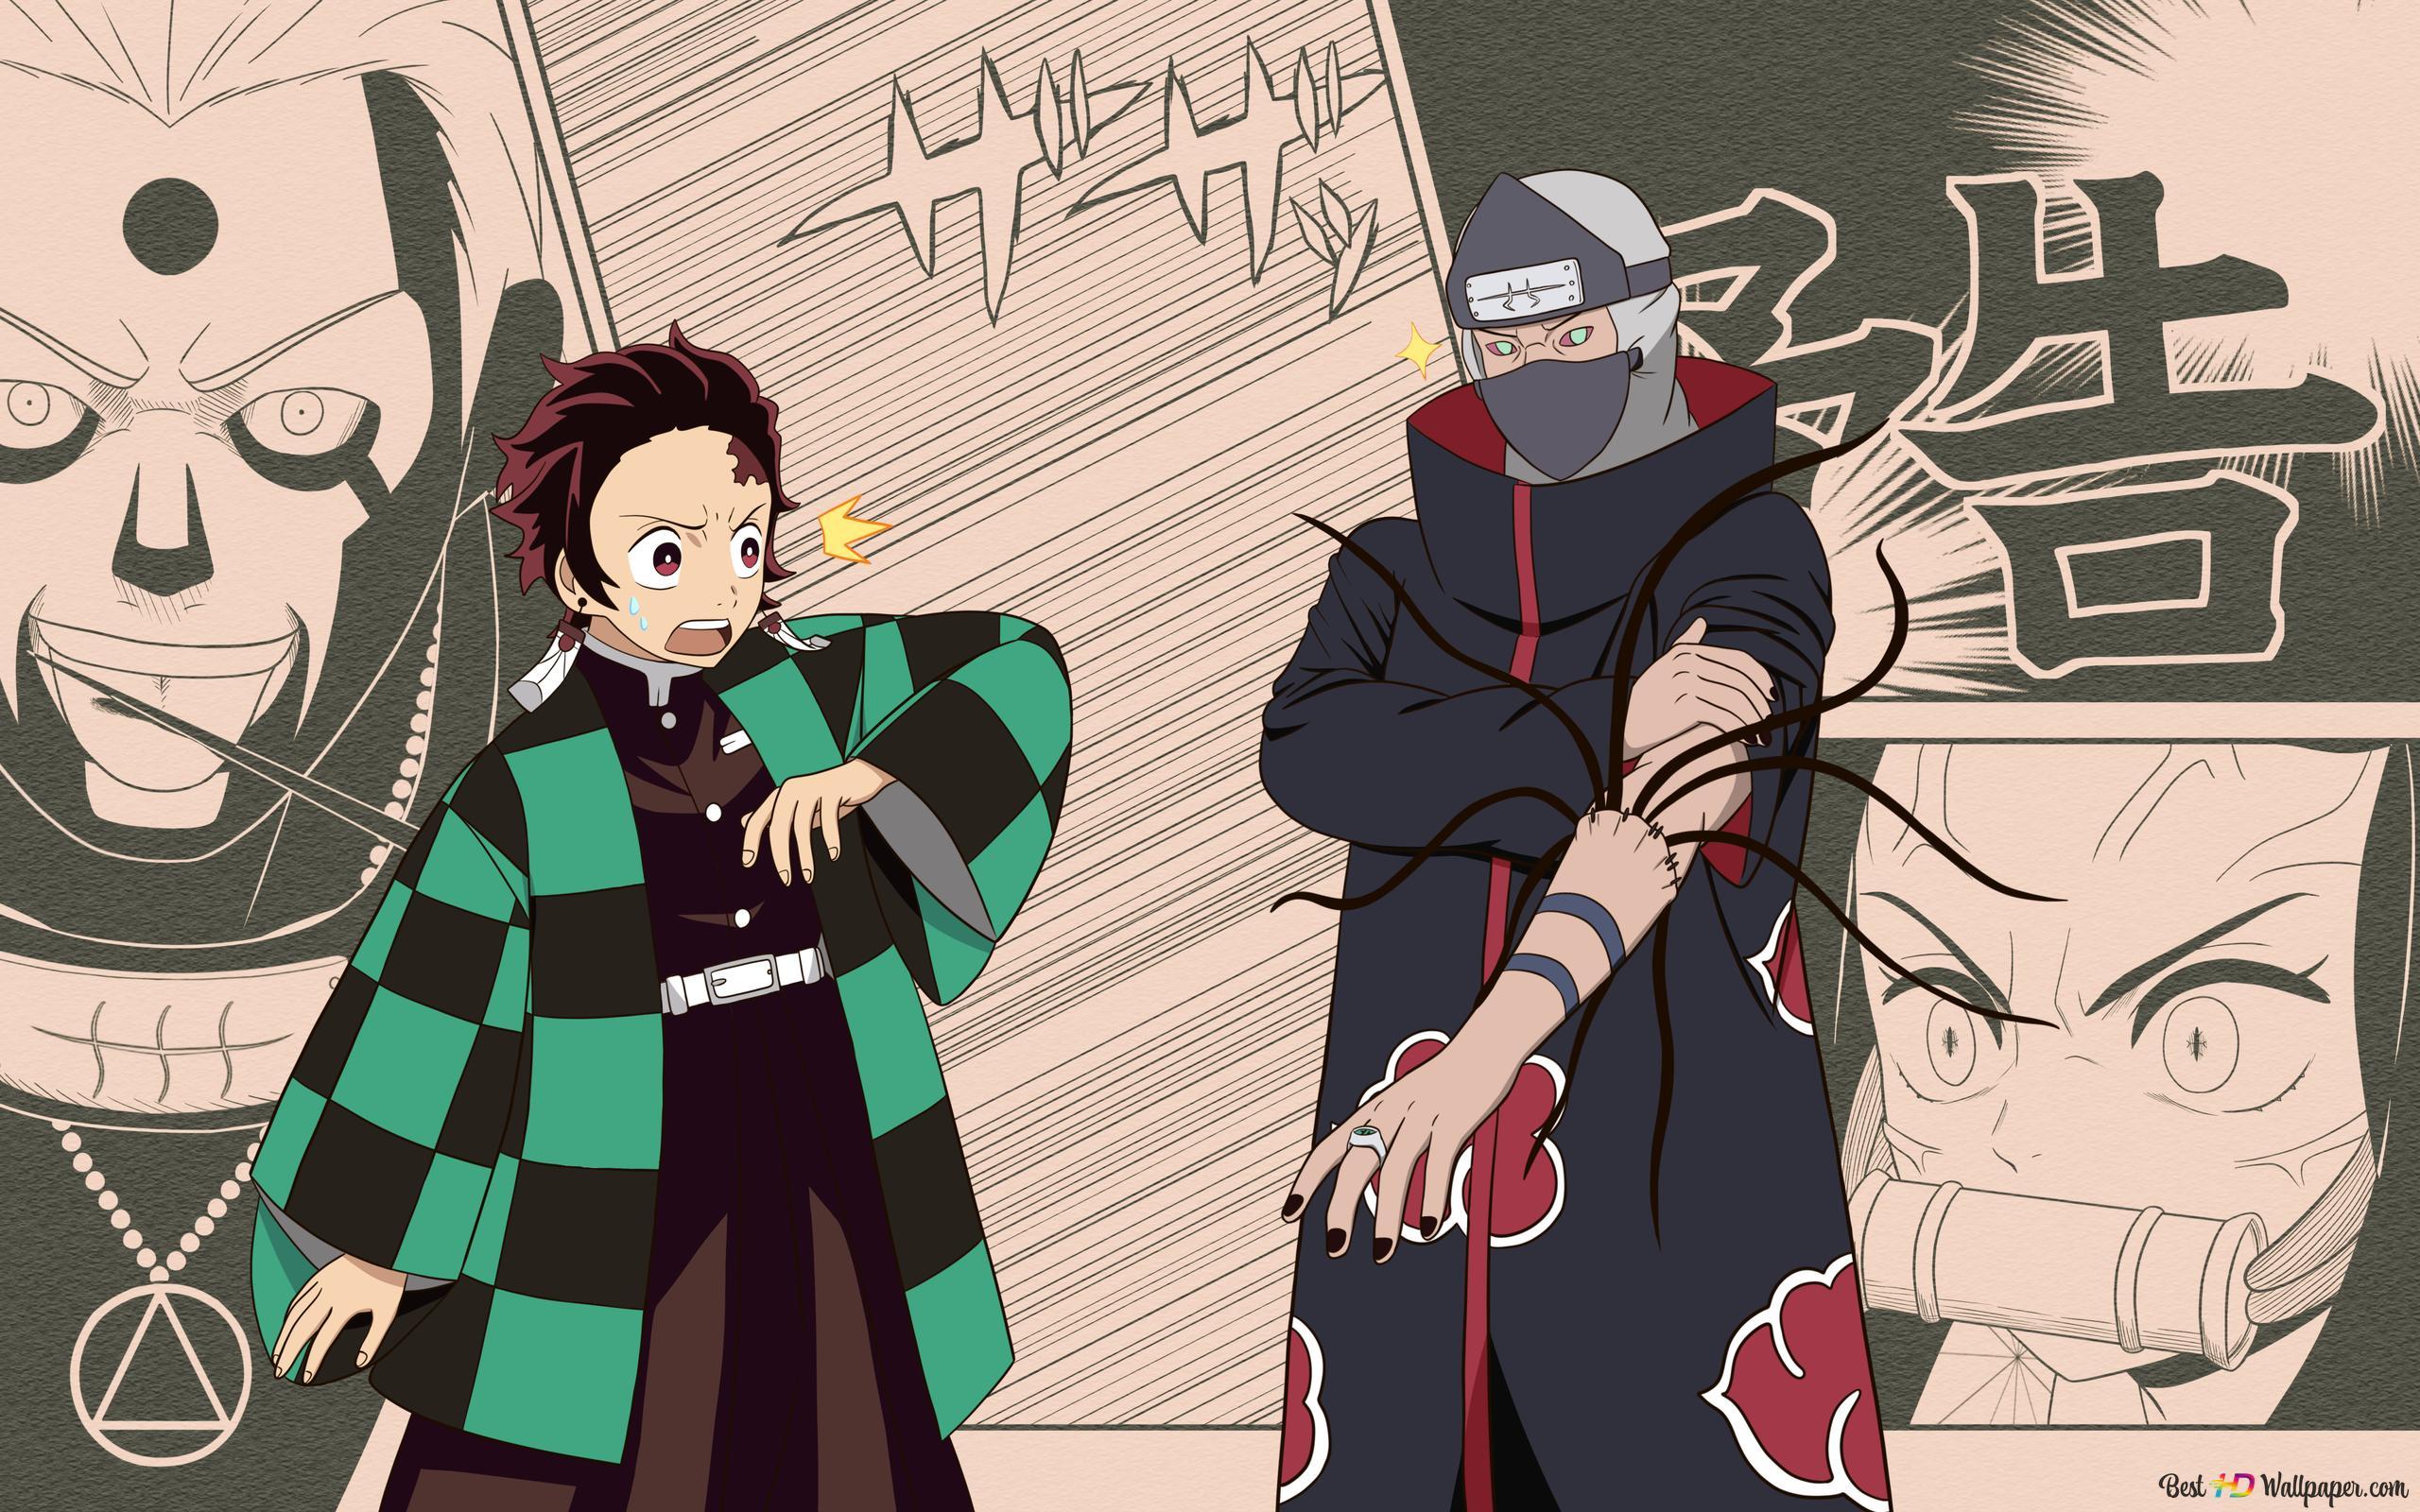 Crossover Naruto And Kimetsu No Yaiba Hd Wallpaper Download #star trek #naruto #star trek tng #naruto crossover #star trek crossover #i have this vague feeling that ive drawn something similar before #specifically naruto riker (william uzumaki?) crossover naruto and kimetsu no yaiba